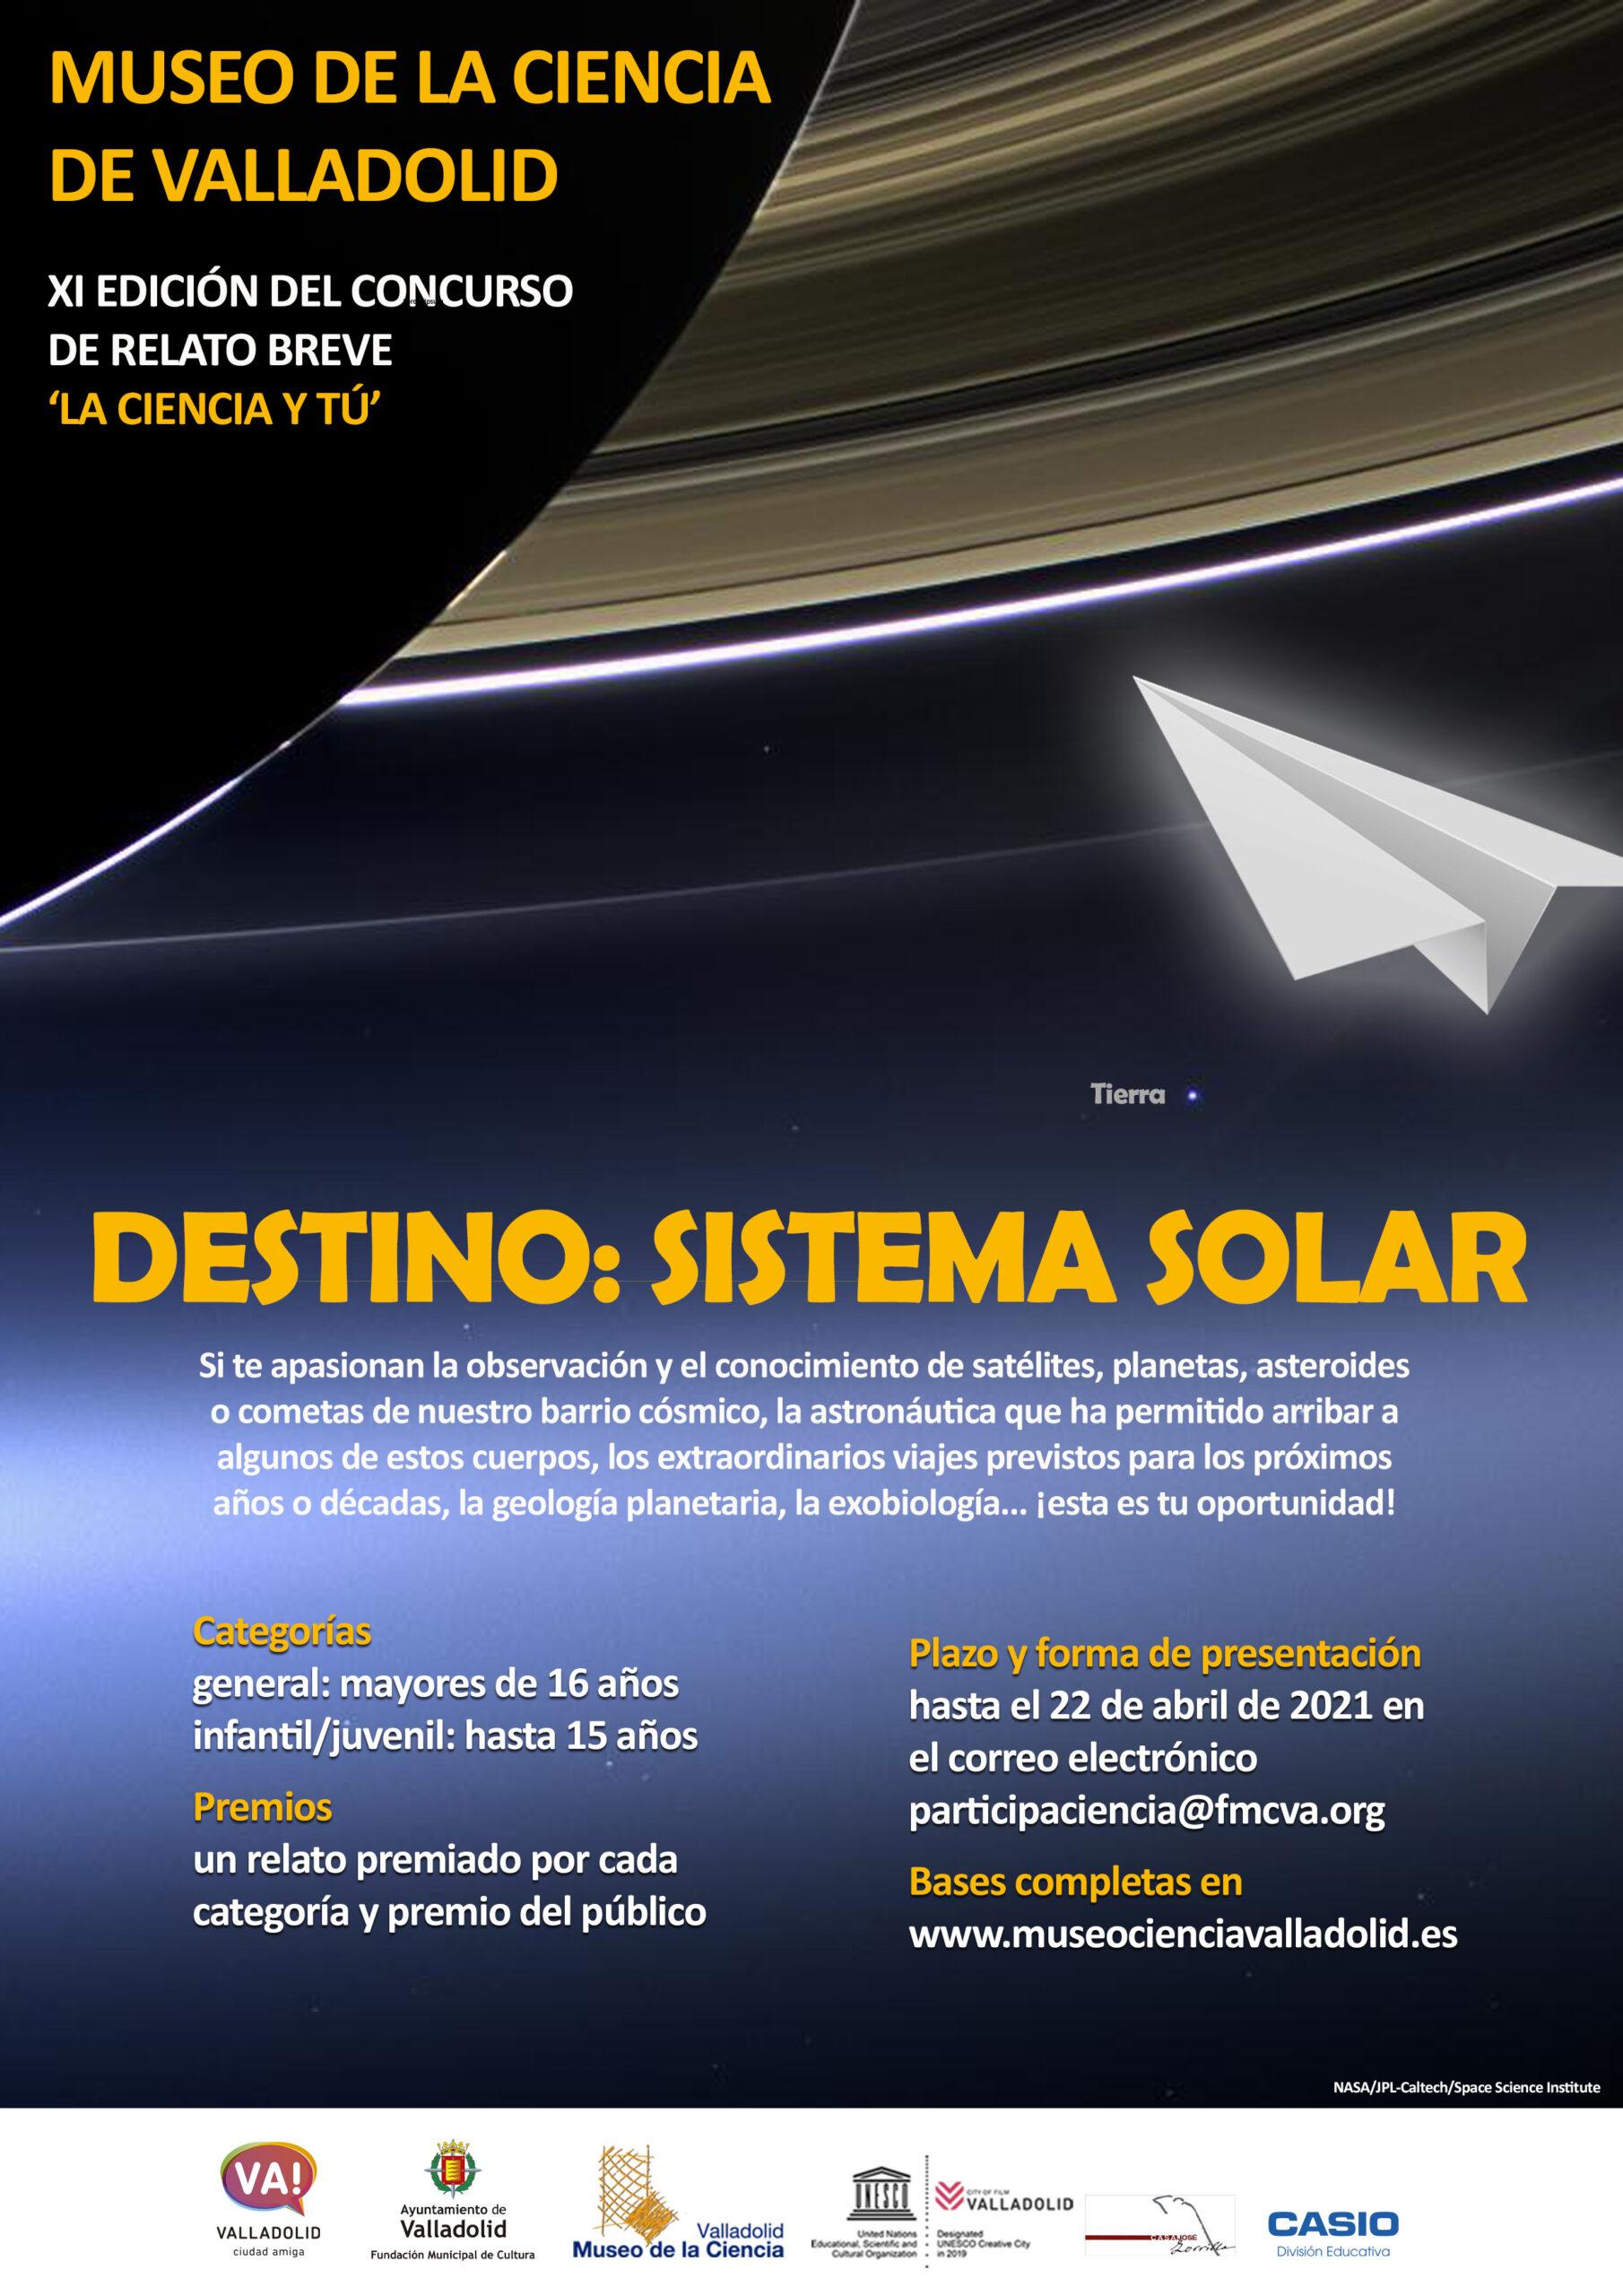 destino sistema solar